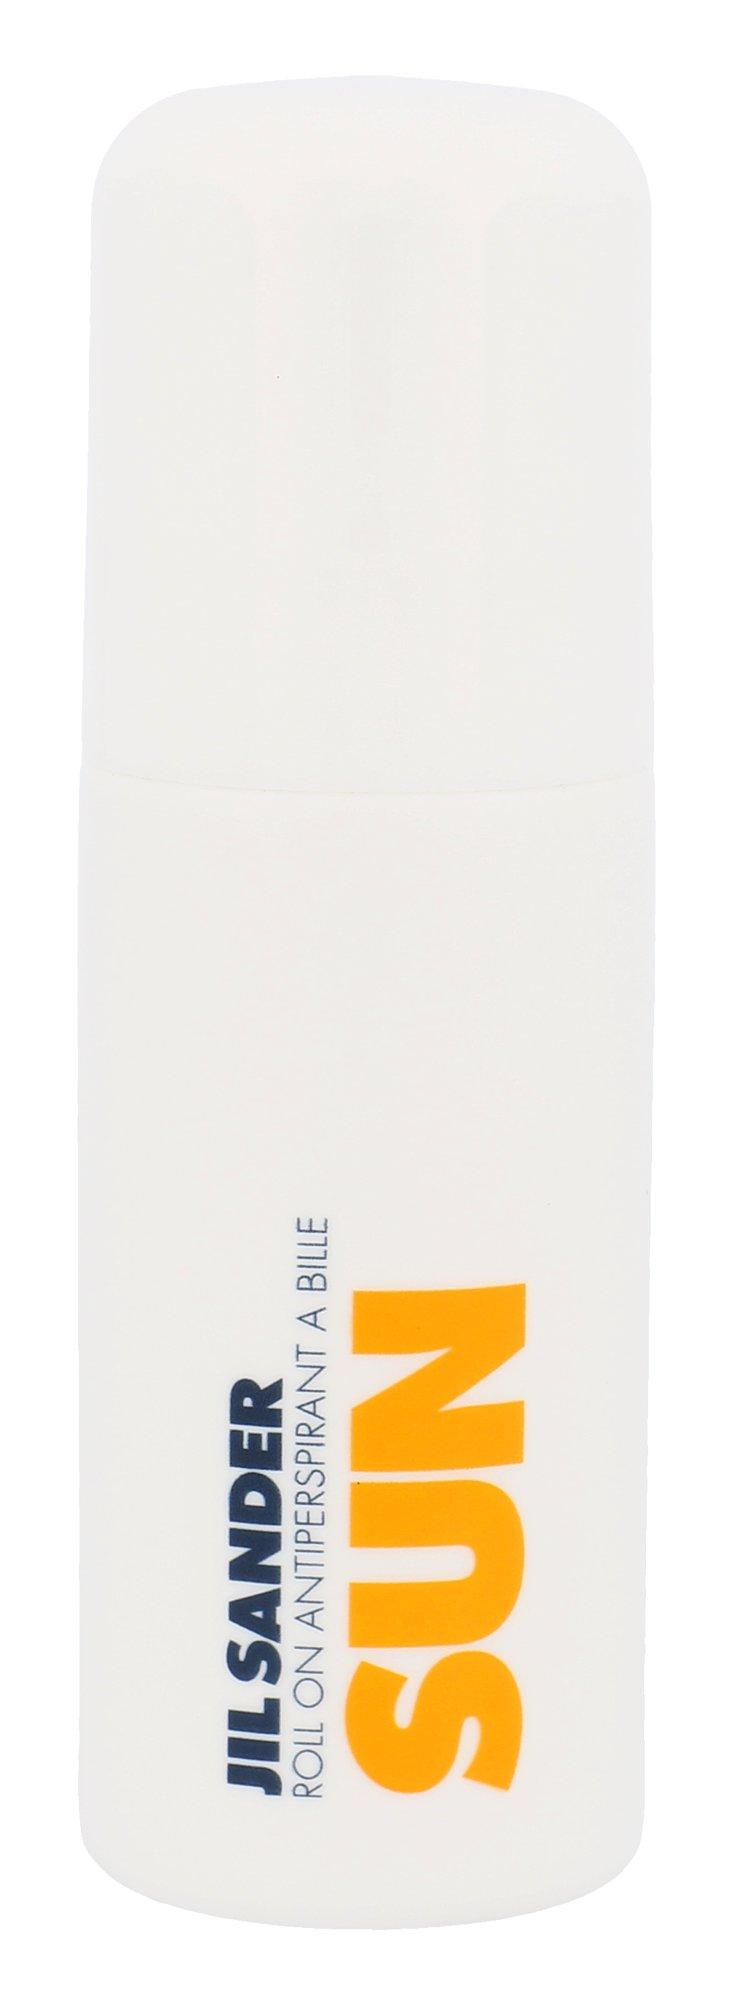 Jil Sander Sun, Deodorant 50ml